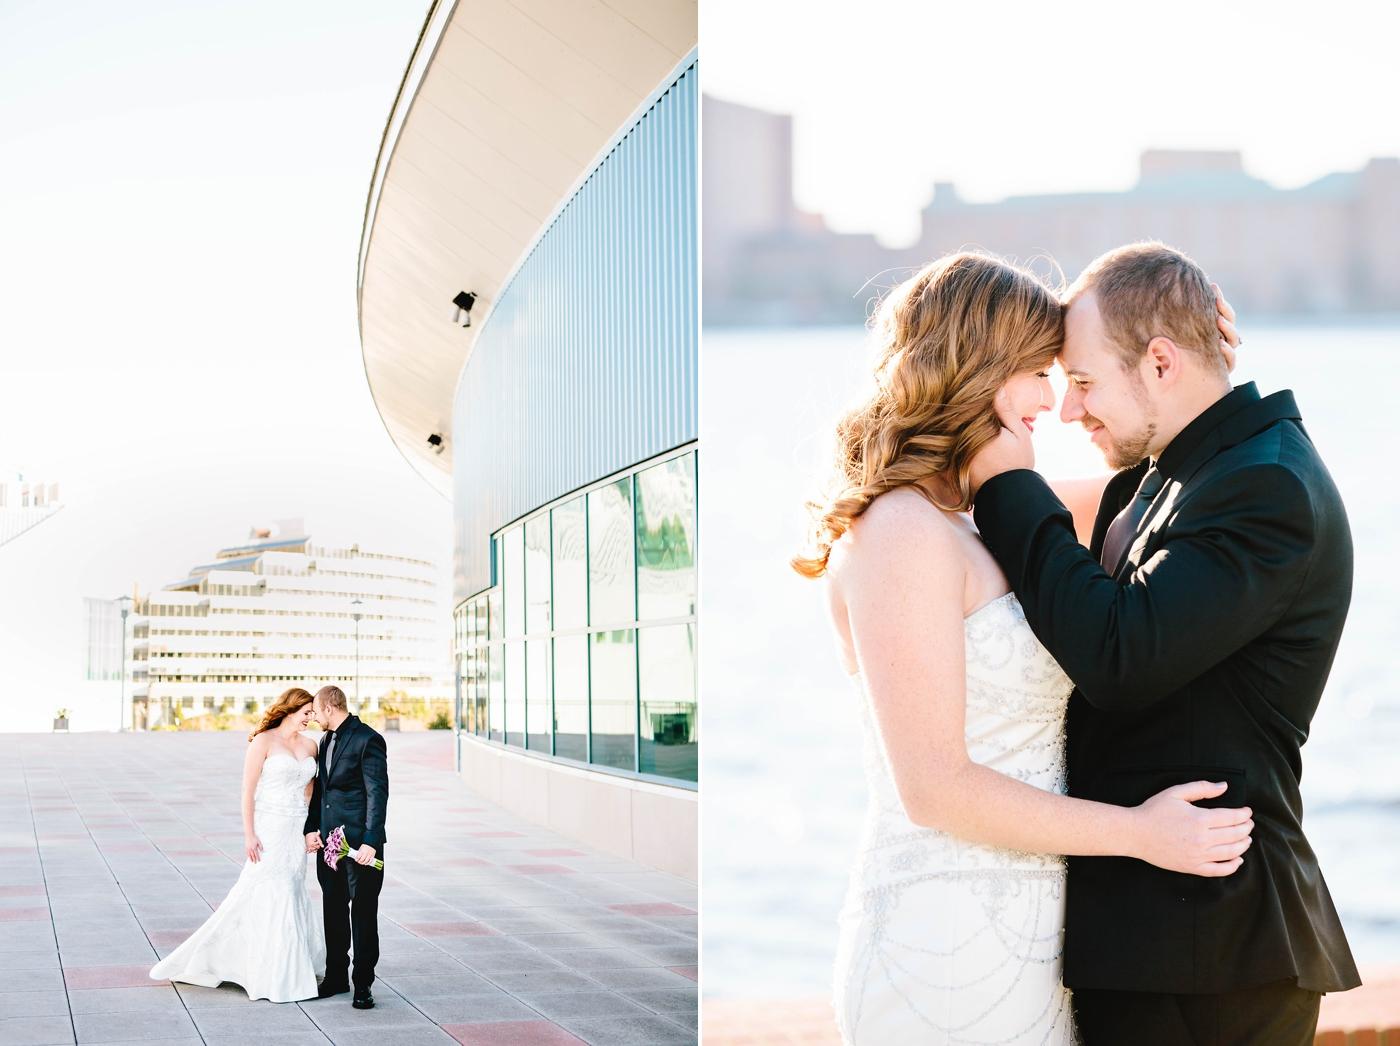 chicago-fine-art-wedding-photography-burnette7